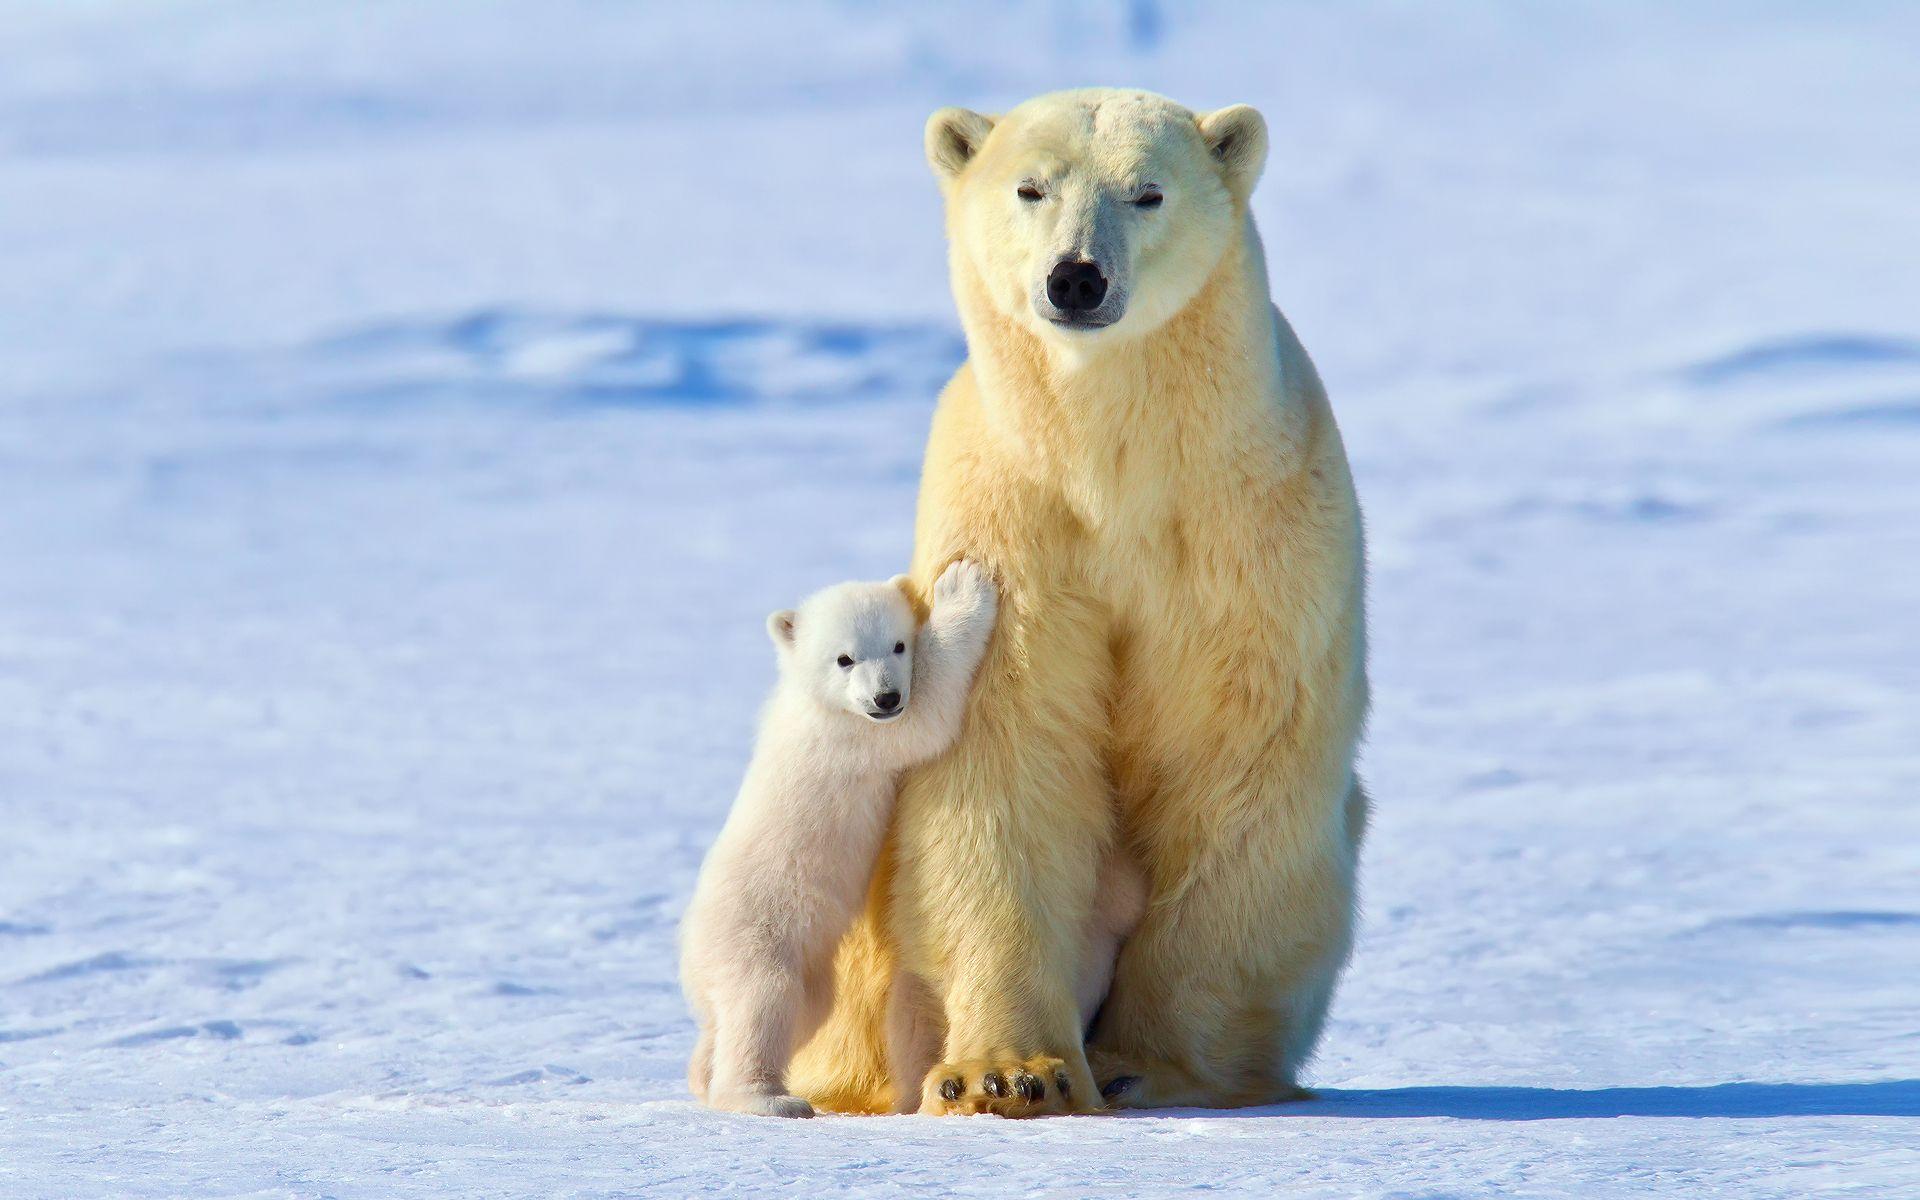 Polar Bears Animals Snow Ice Baby Animals Wallpaper No 5678 Polar Bear Wallpaper Baby Polar Bears Polar Bear Animal polar bears on ice wallpapers hd